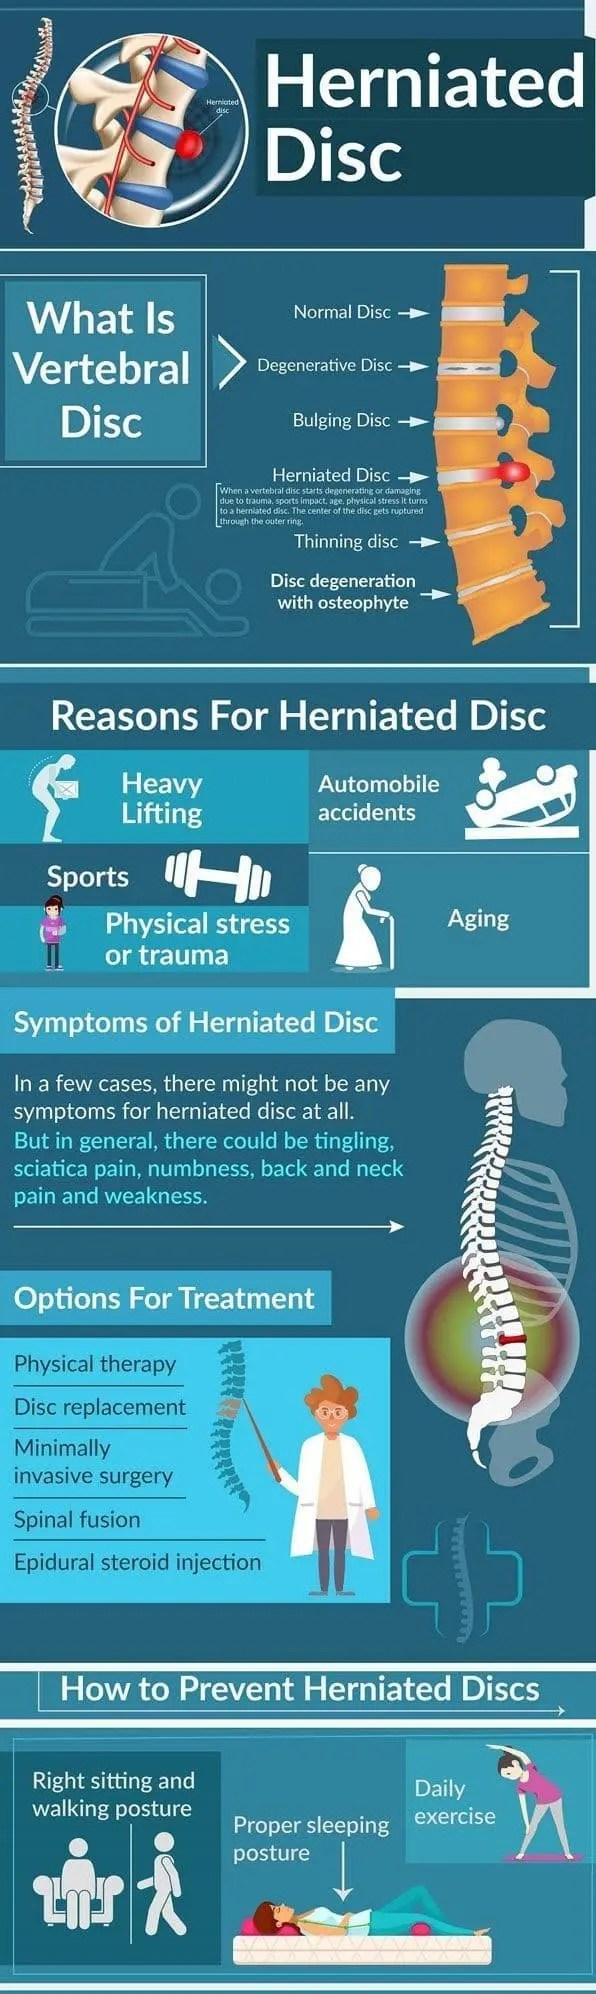 Herniated Dic